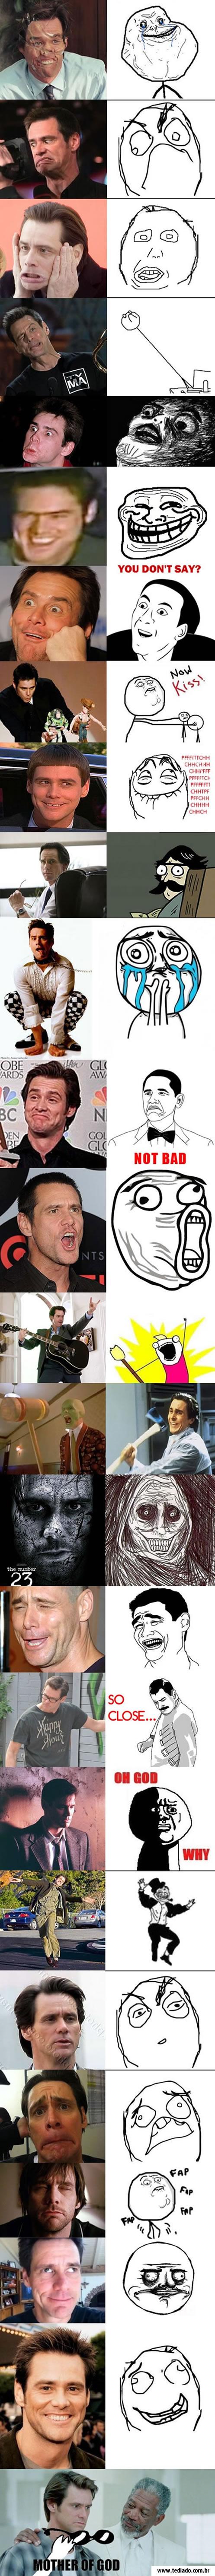 Memes com Jim Carrey 1